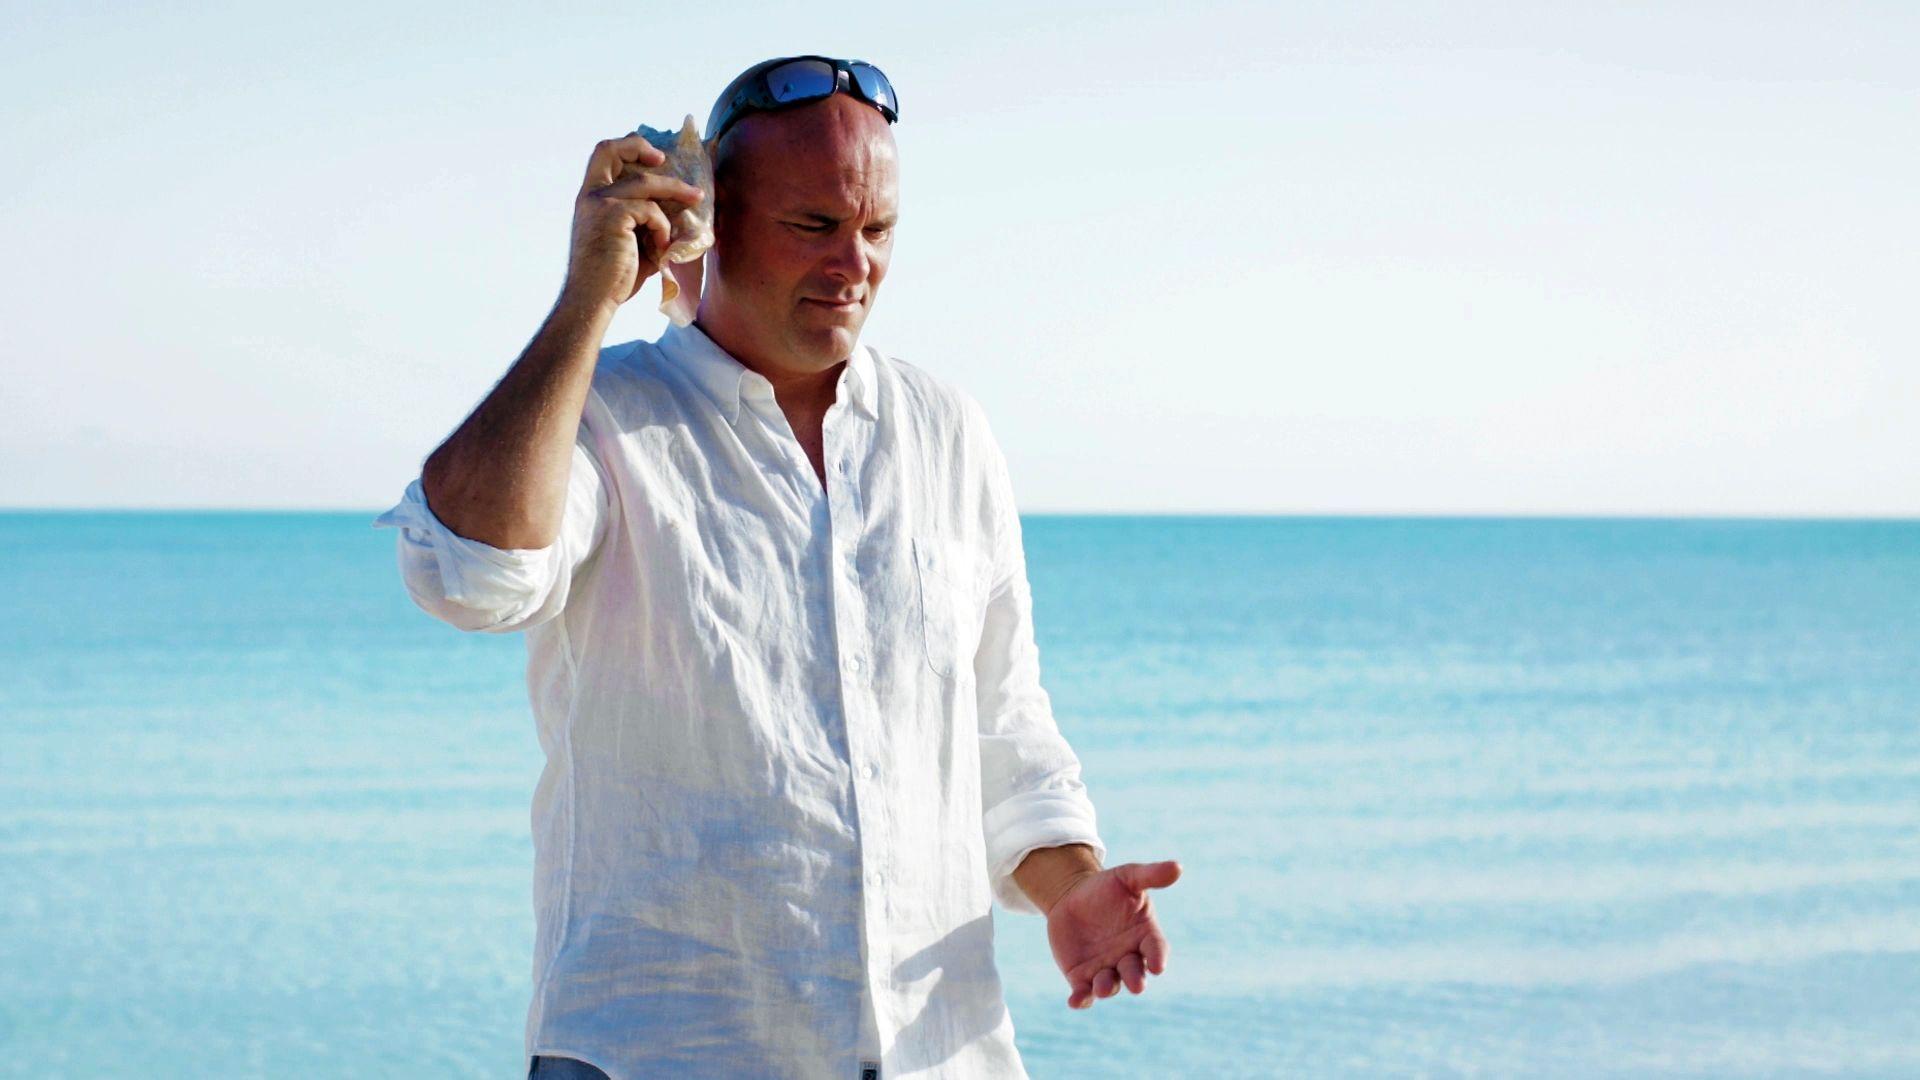 Bryan baeumler tries to take a walk on the beach then